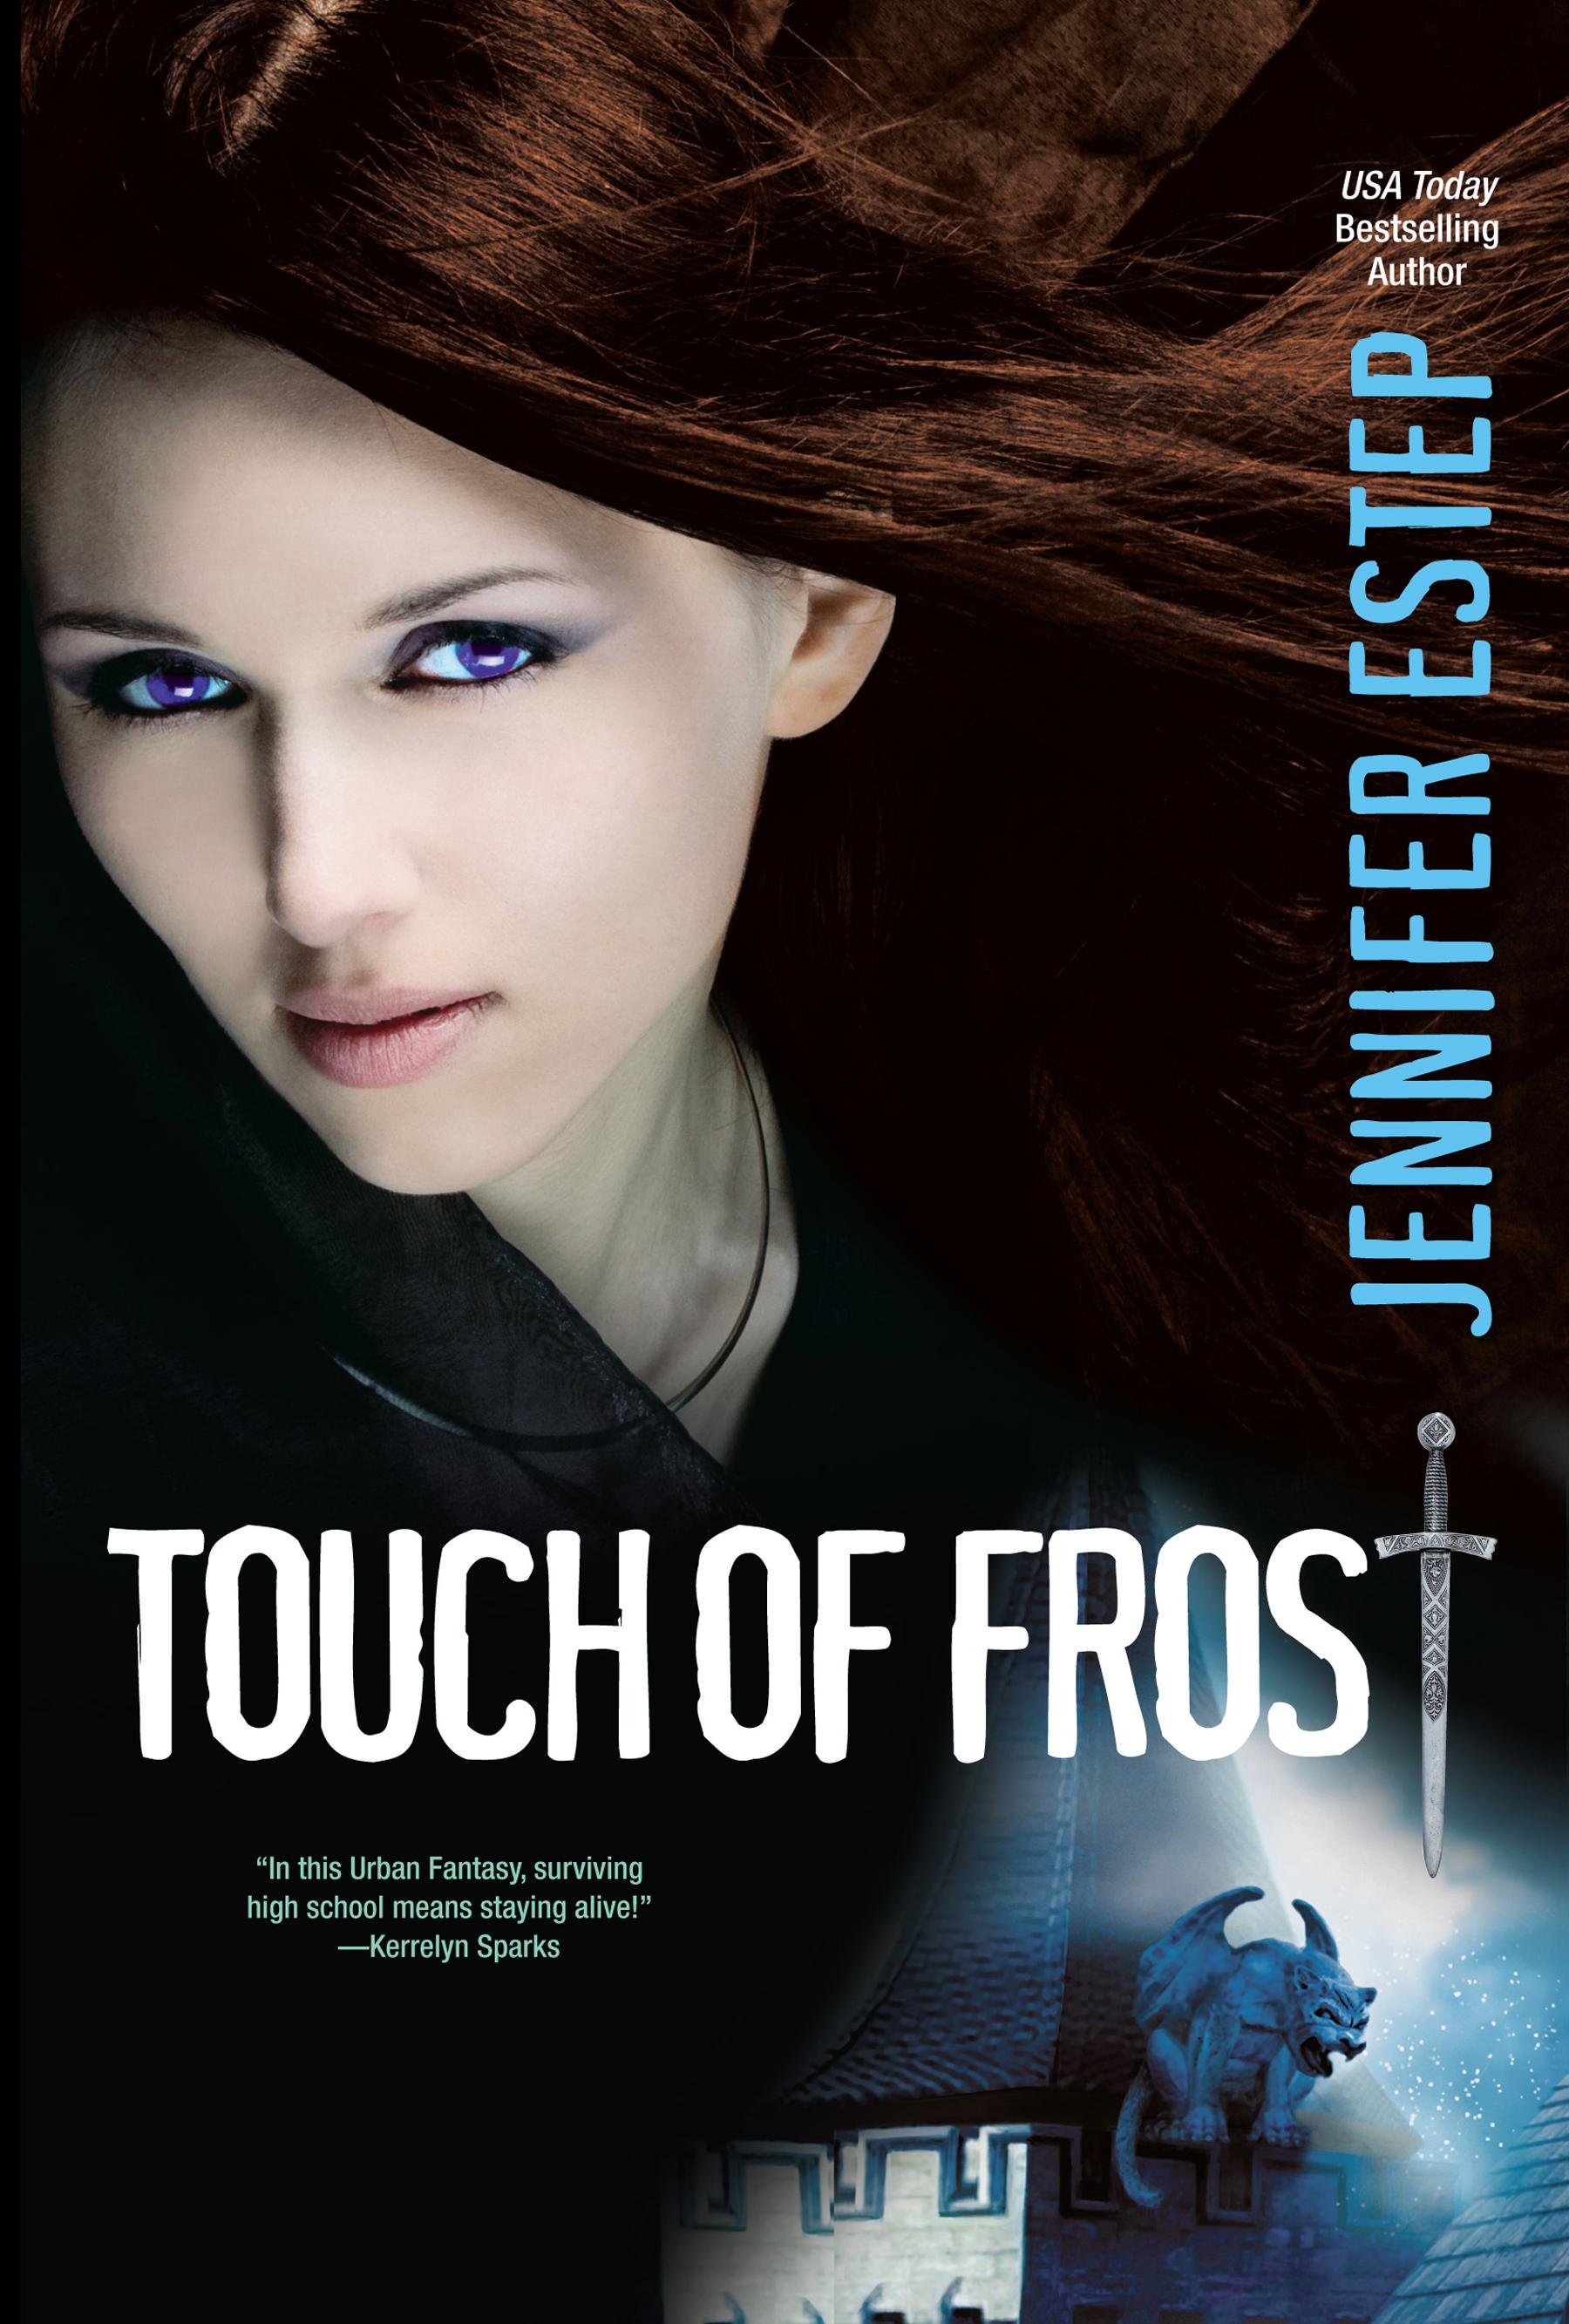 Jennifer Estep | Touch of Frost new final